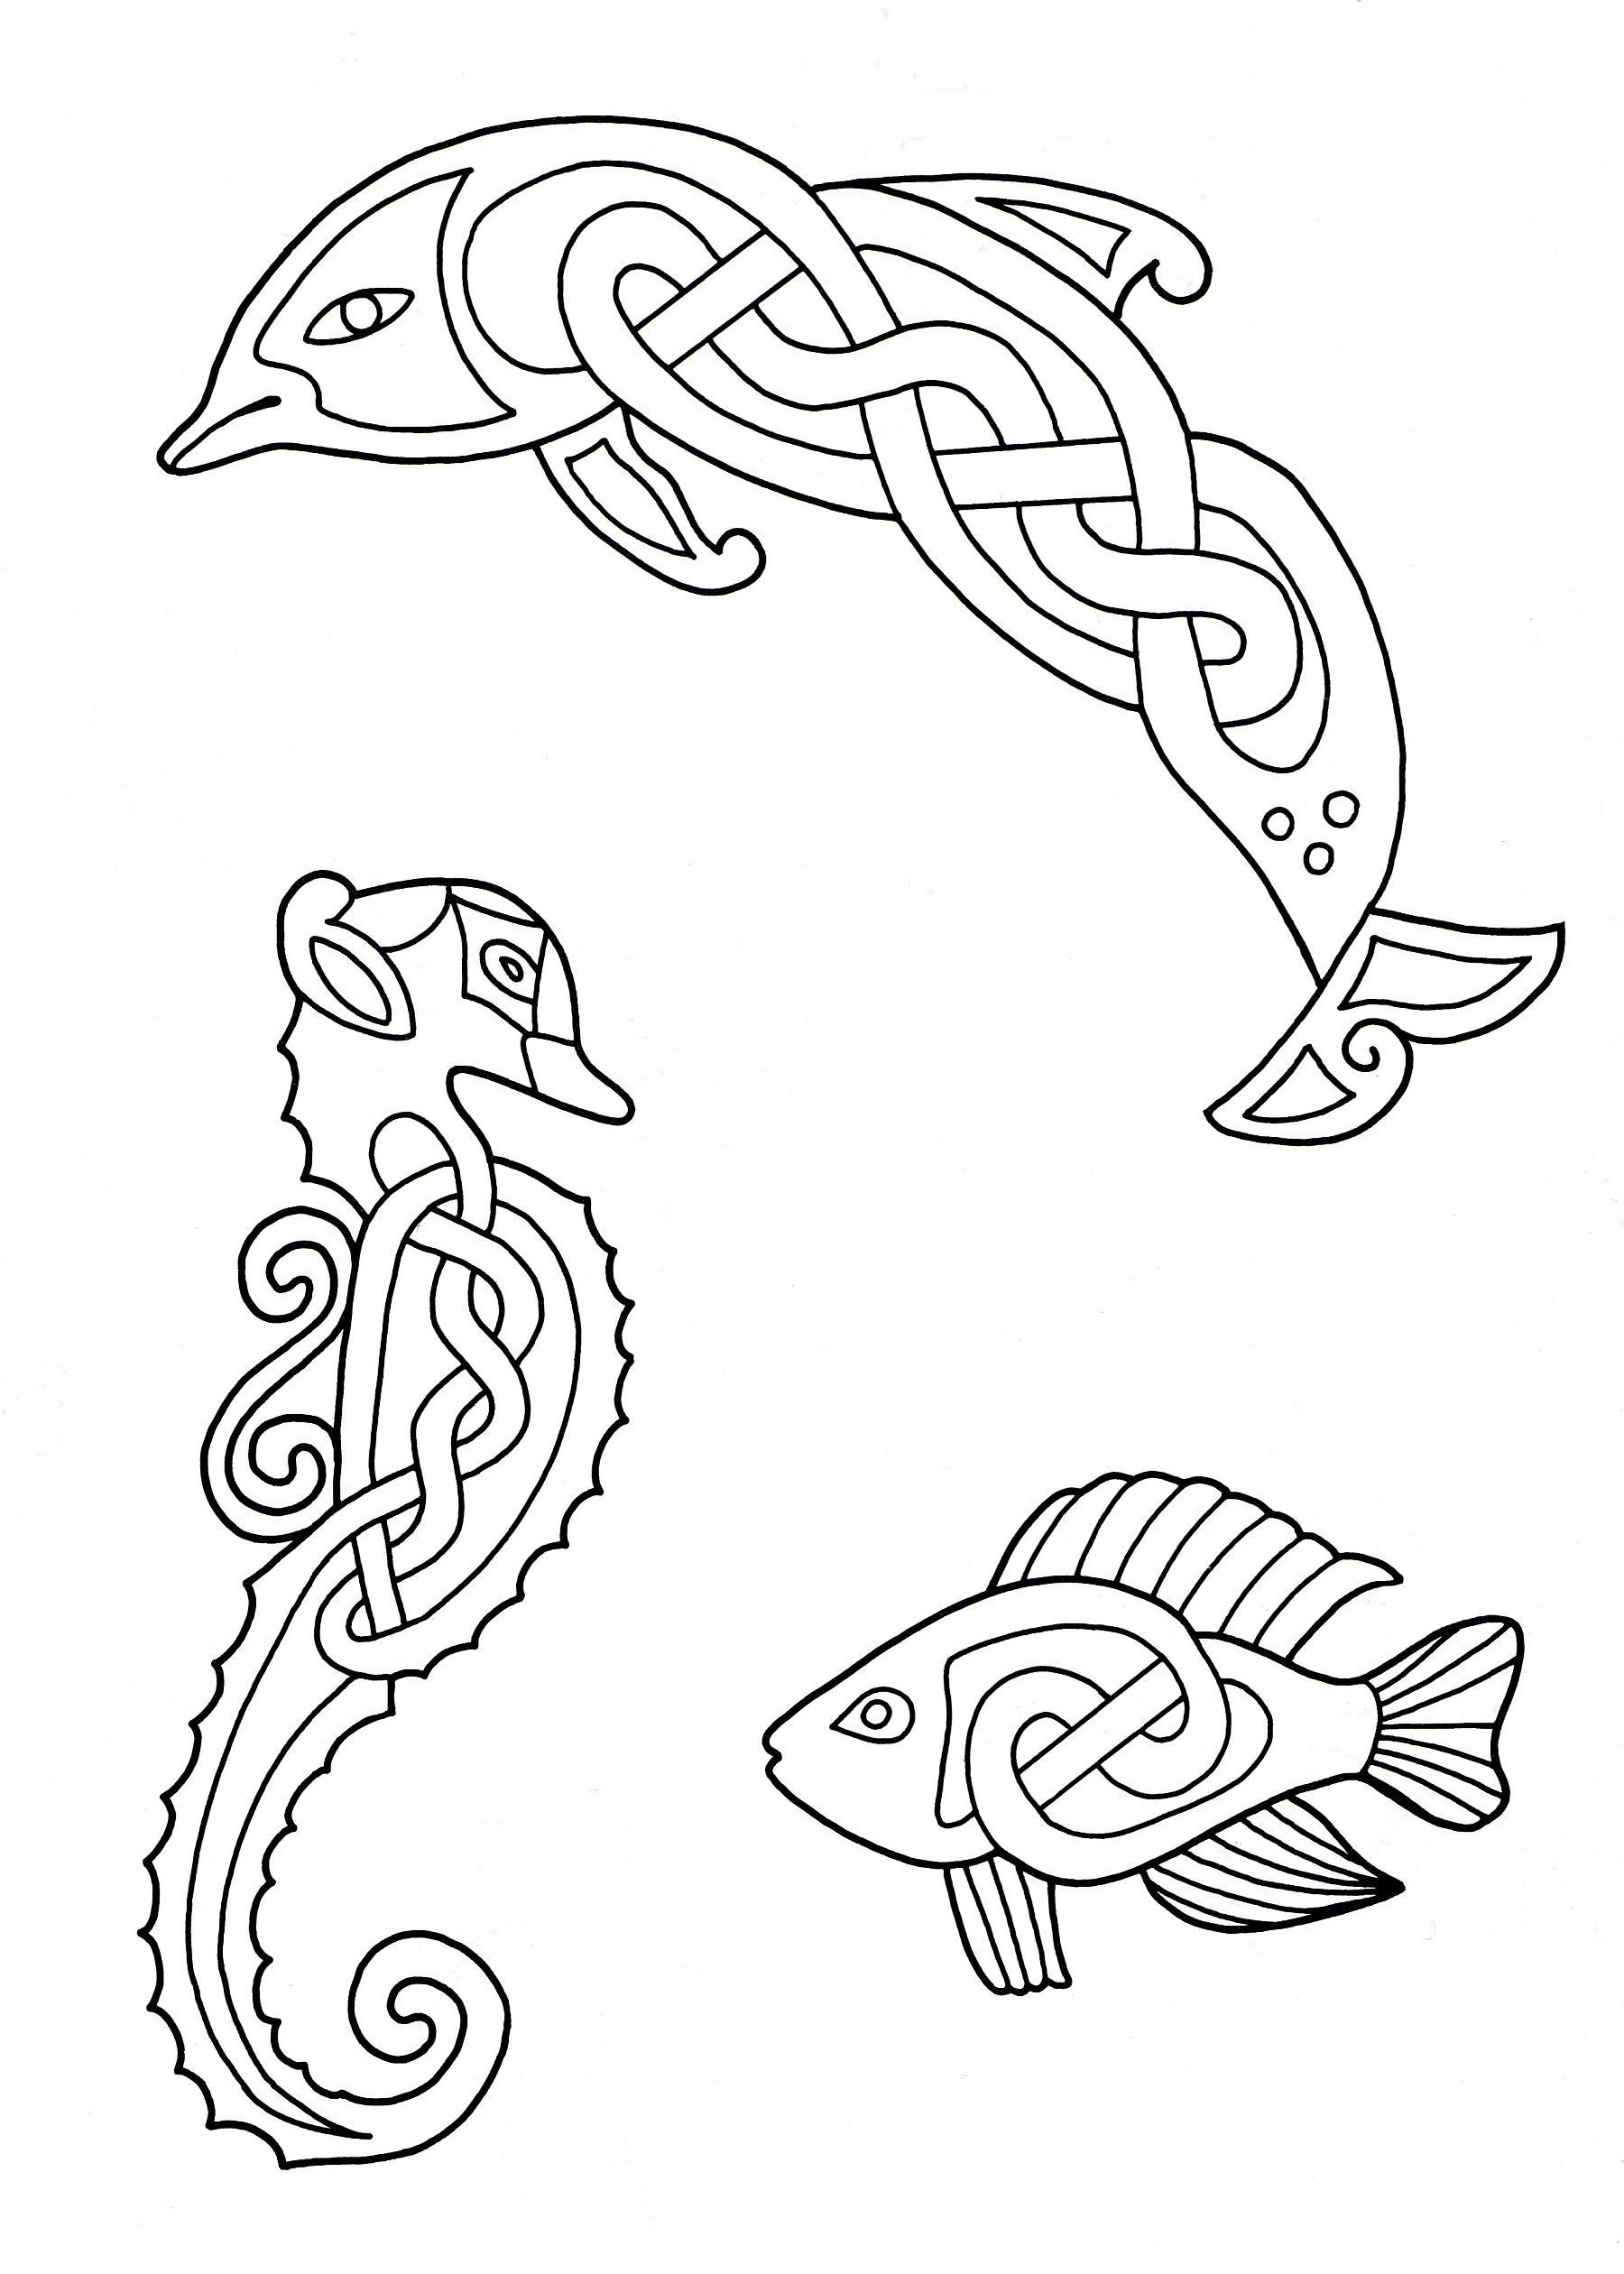 Celtic Design 047 | Flickr - Photo Sharing!